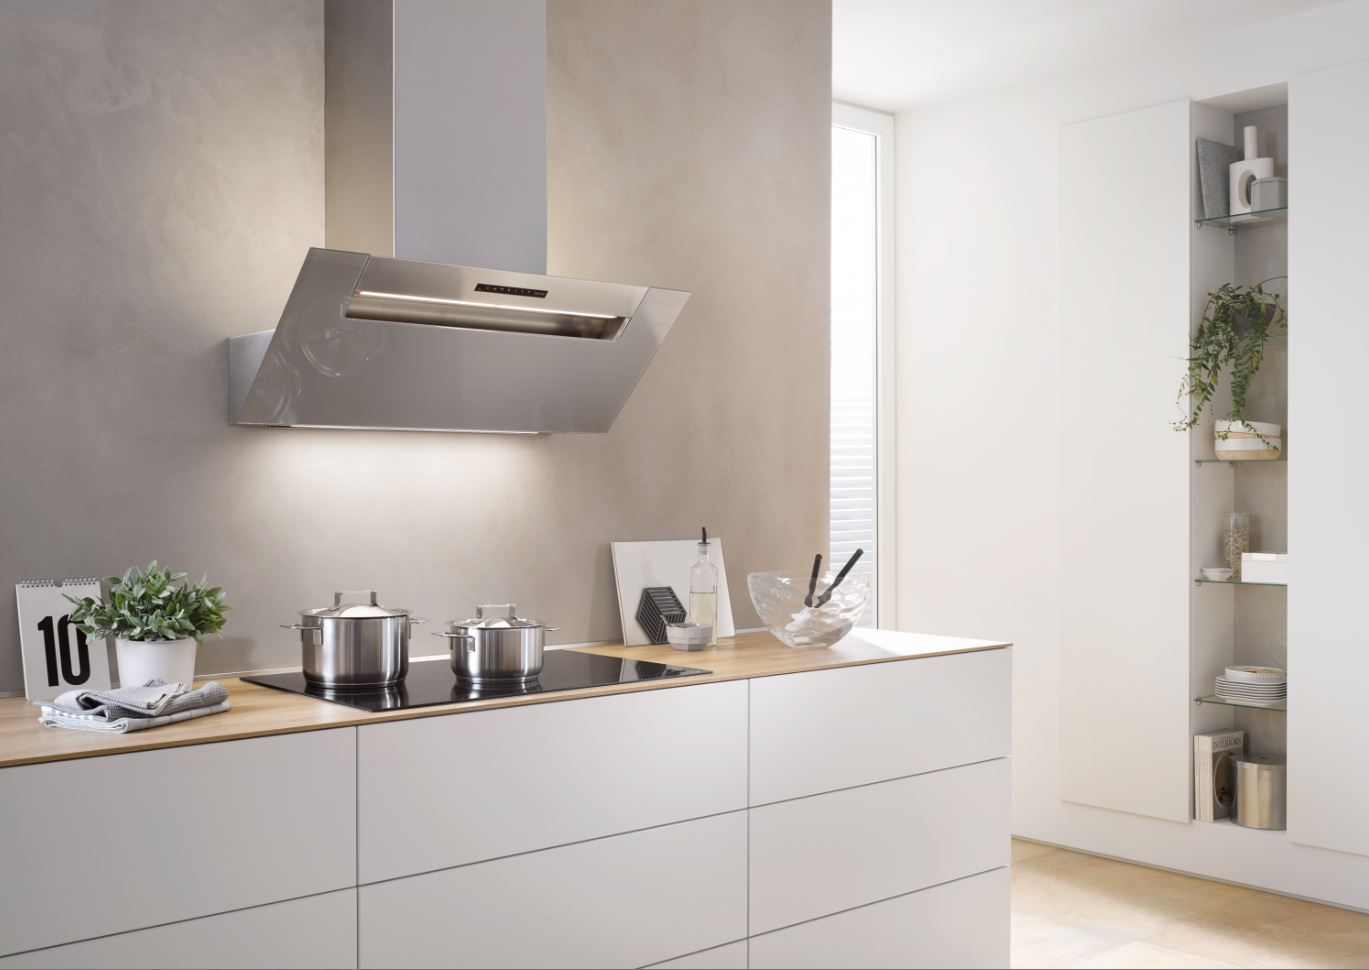 berbel ergoline 2 bkh 70 eg 2 silber metallic 1040108. Black Bedroom Furniture Sets. Home Design Ideas